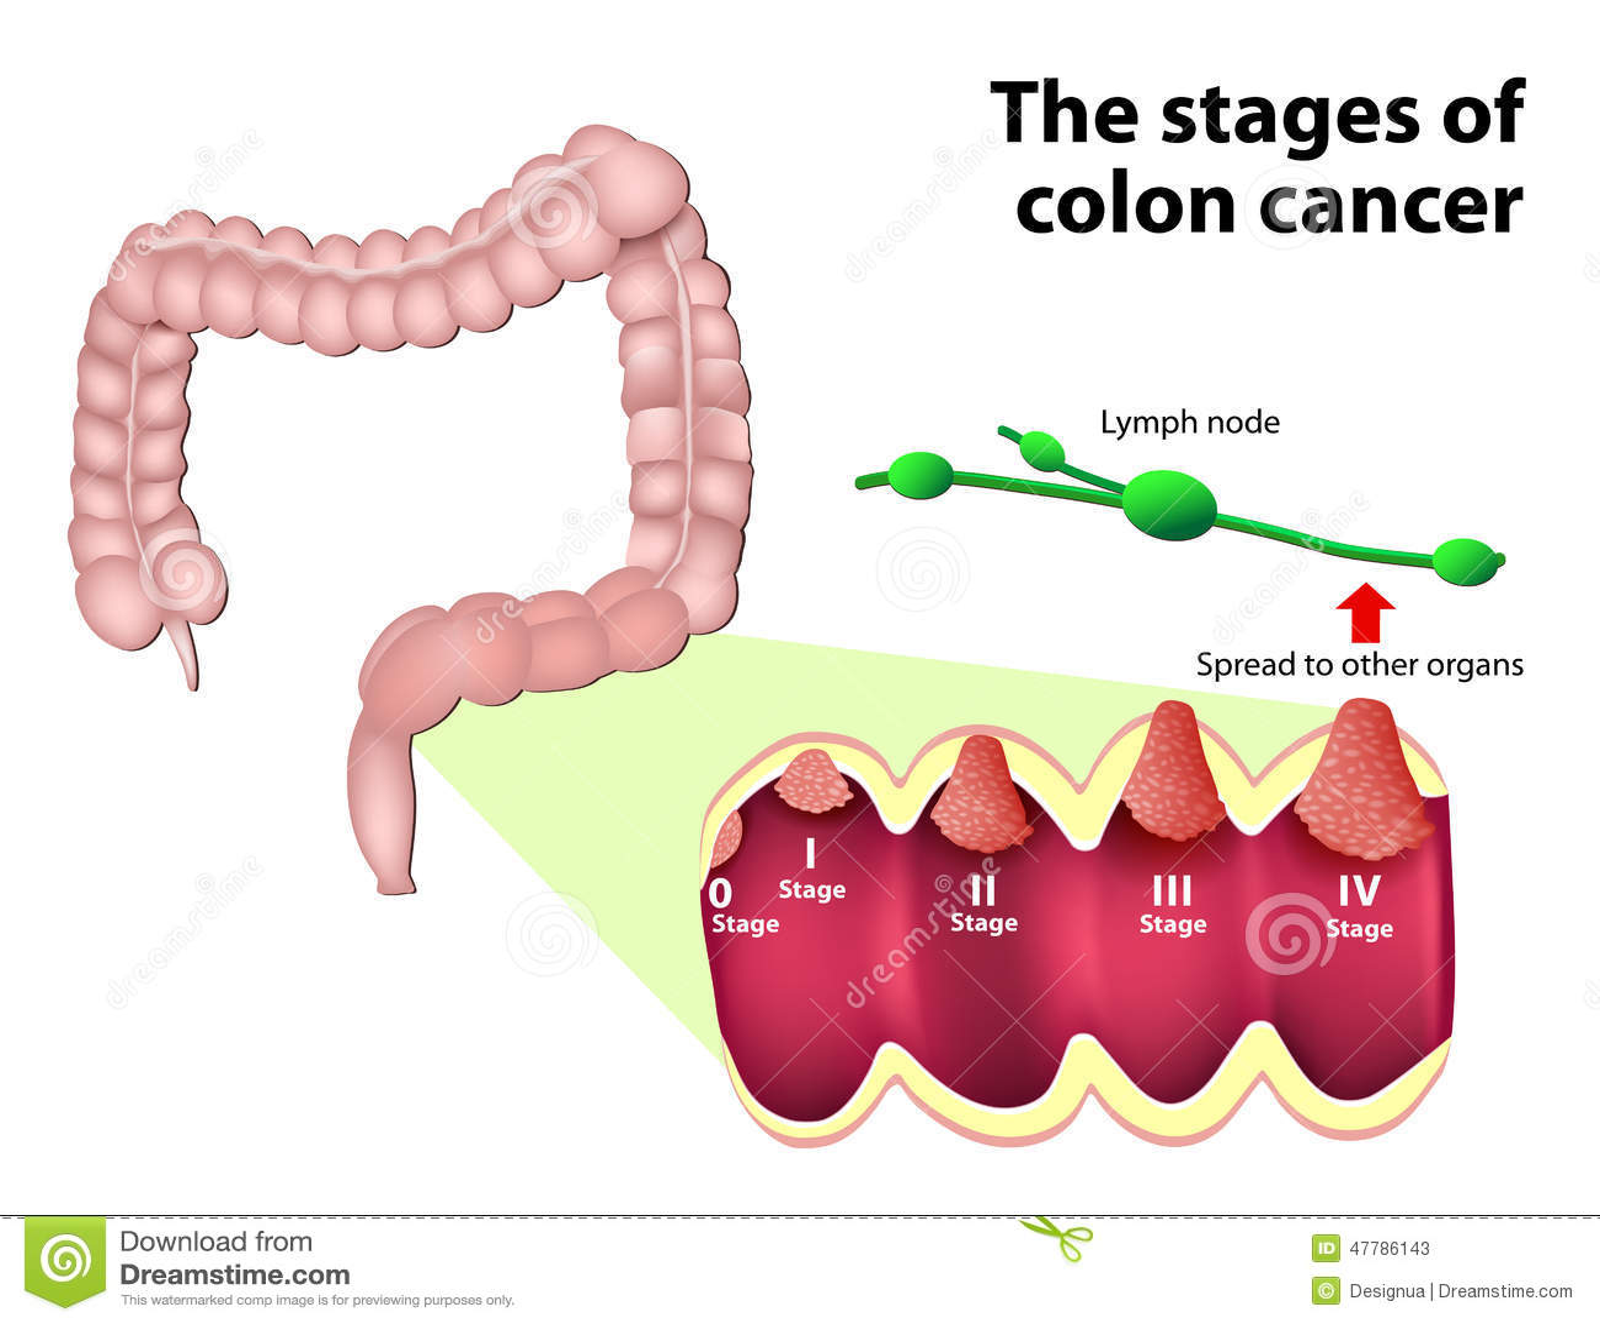 Morcovii pot reduce riscul de cancer colorectal? | nucleus-mc.ro